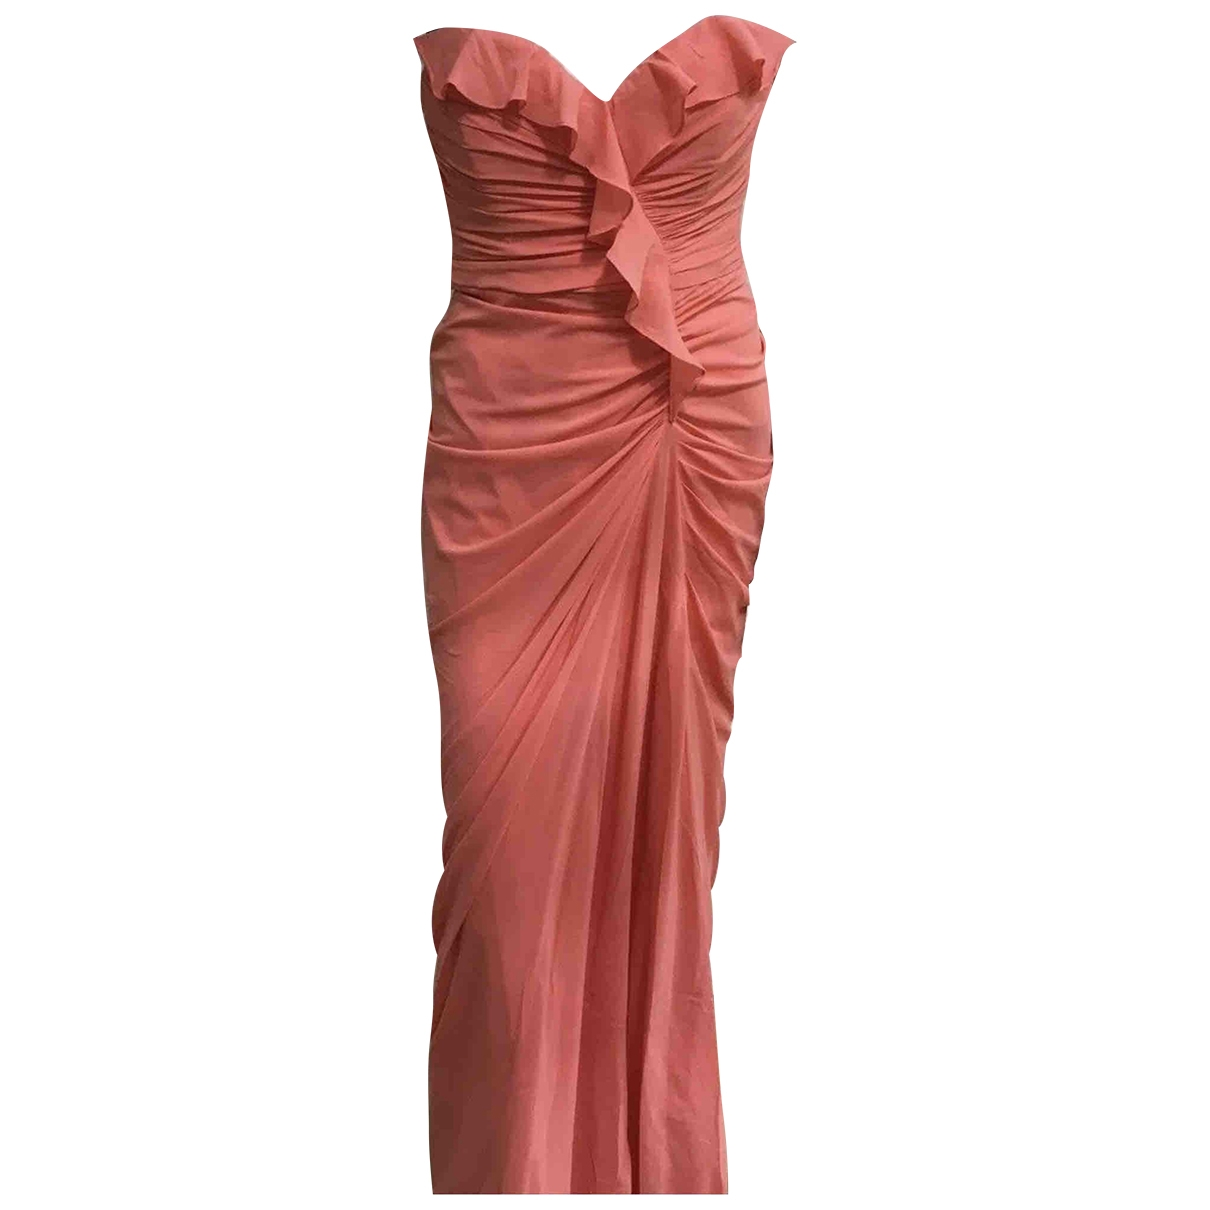 Badgley Mischka \N Kleid in  Orange Baumwolle - Elasthan